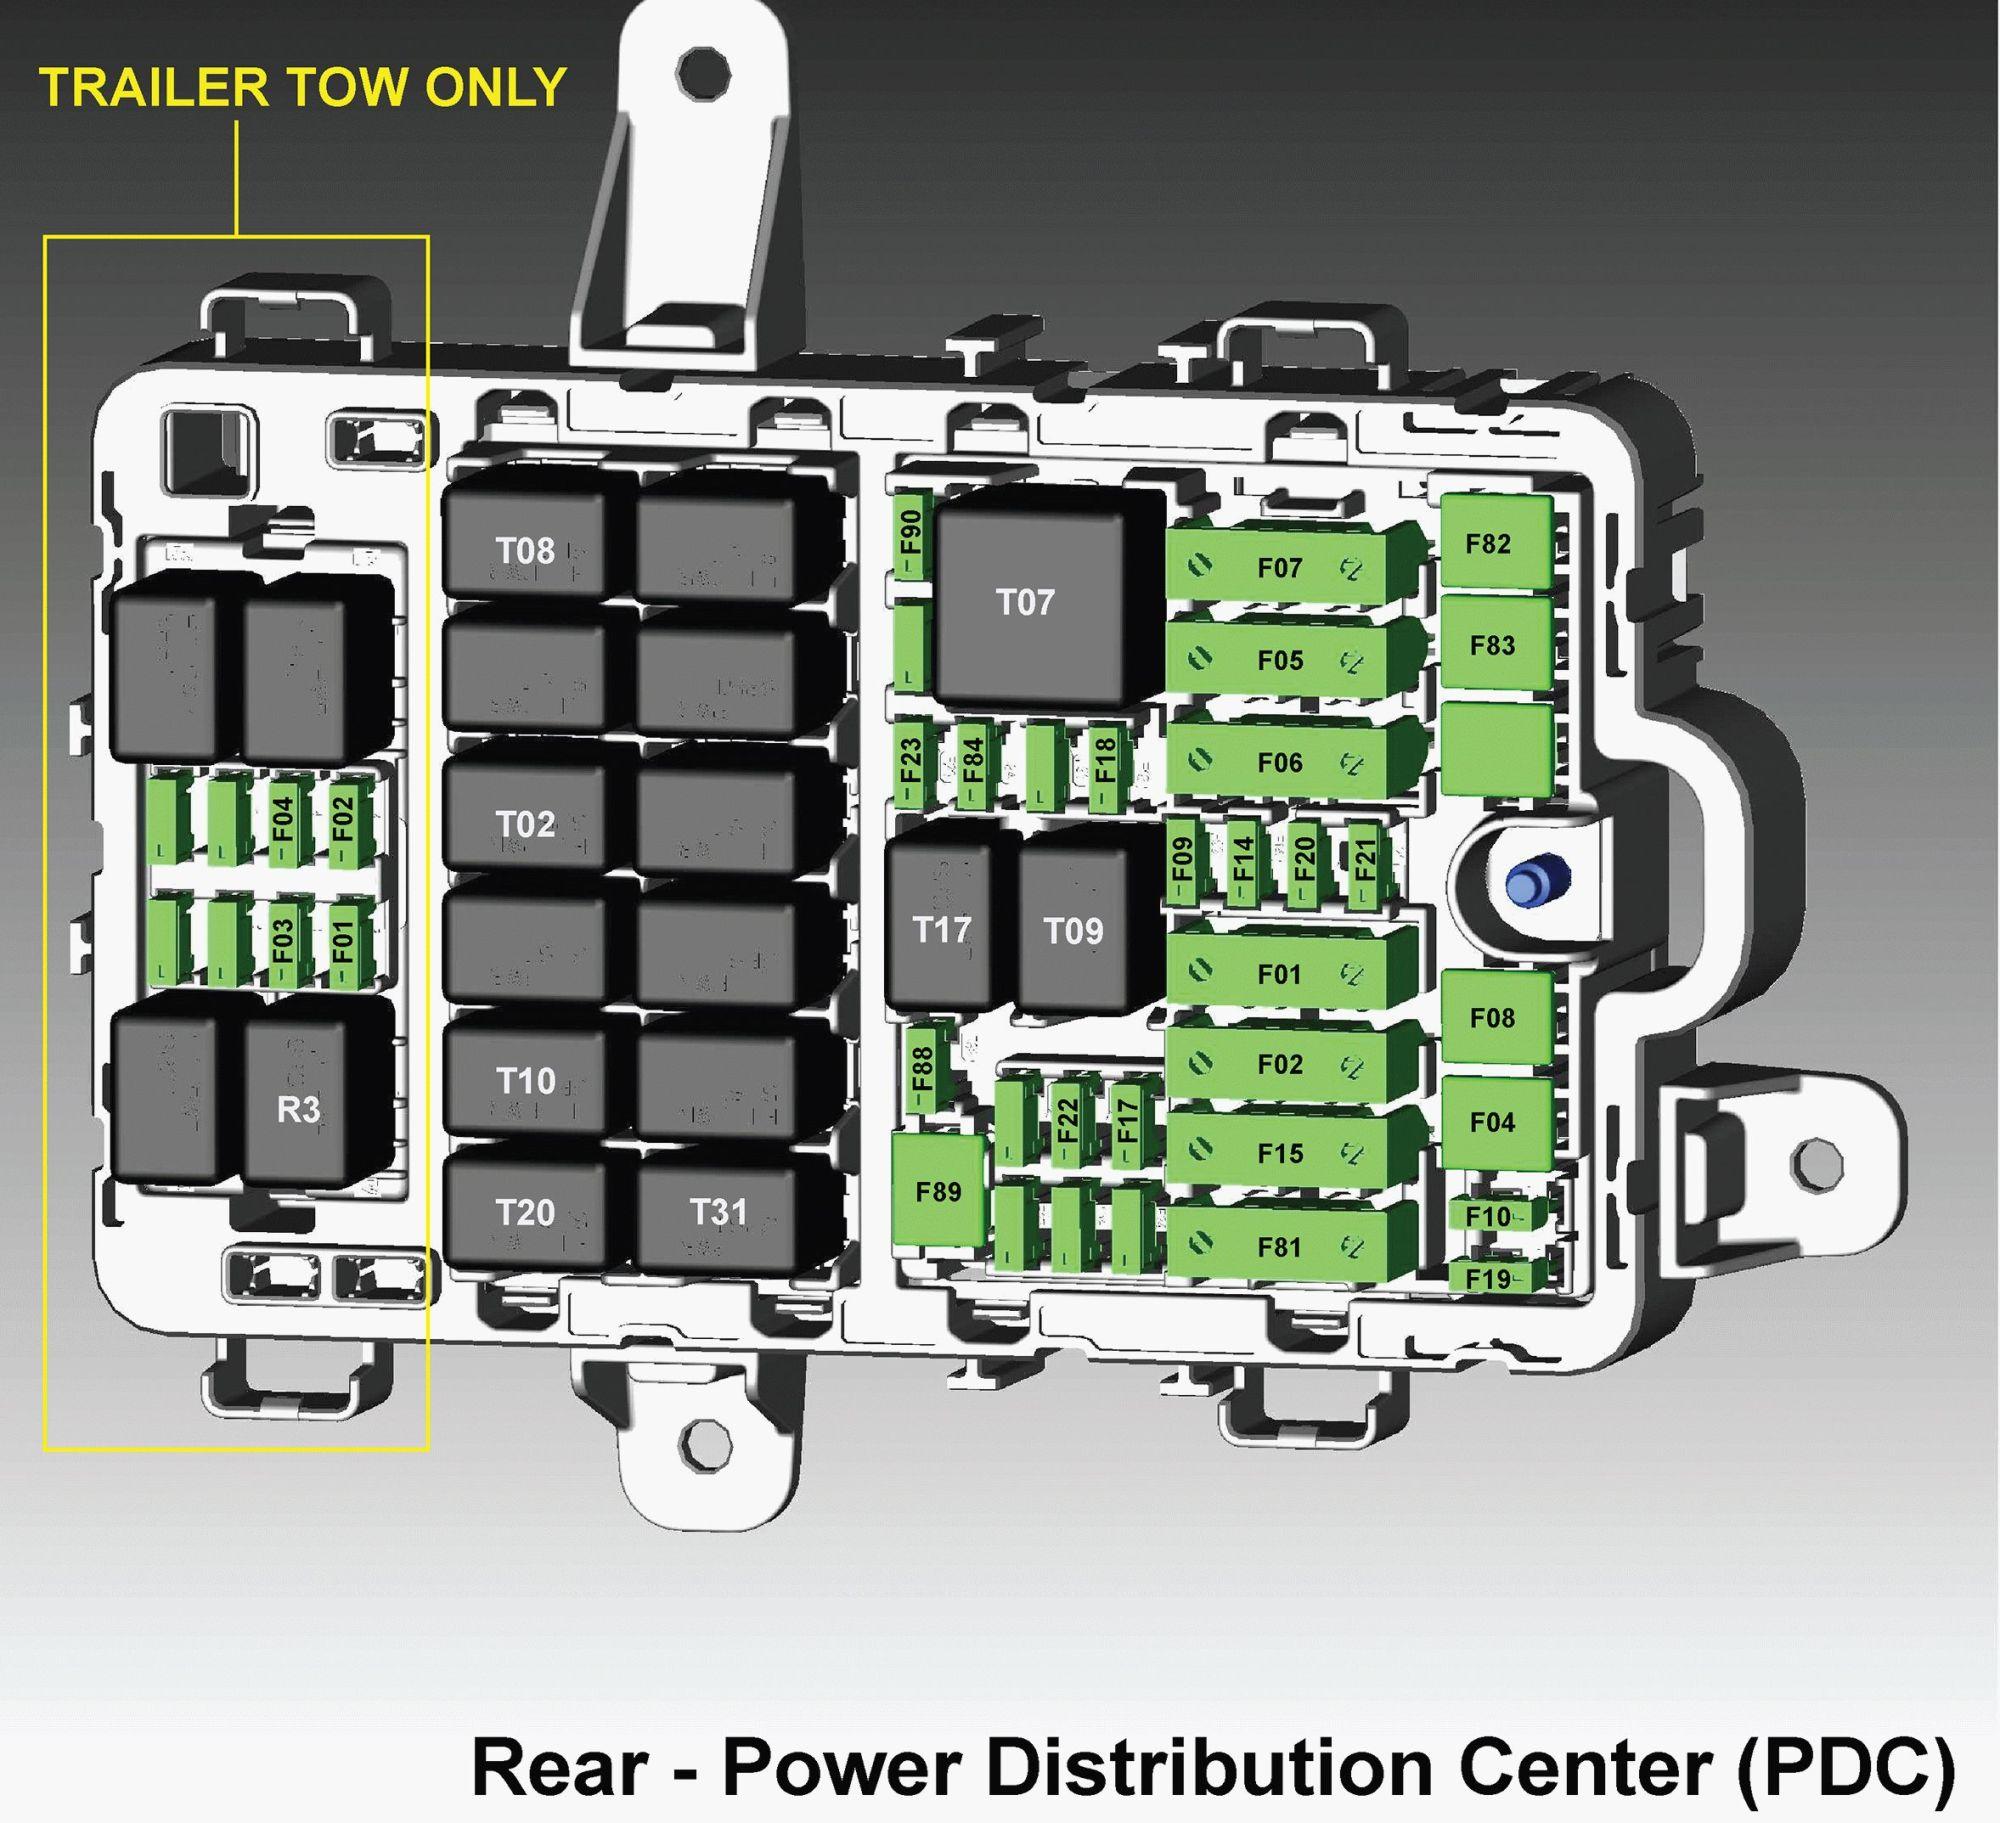 hight resolution of alfa romeo giulia fuse box diagram rear power distribution center pdc